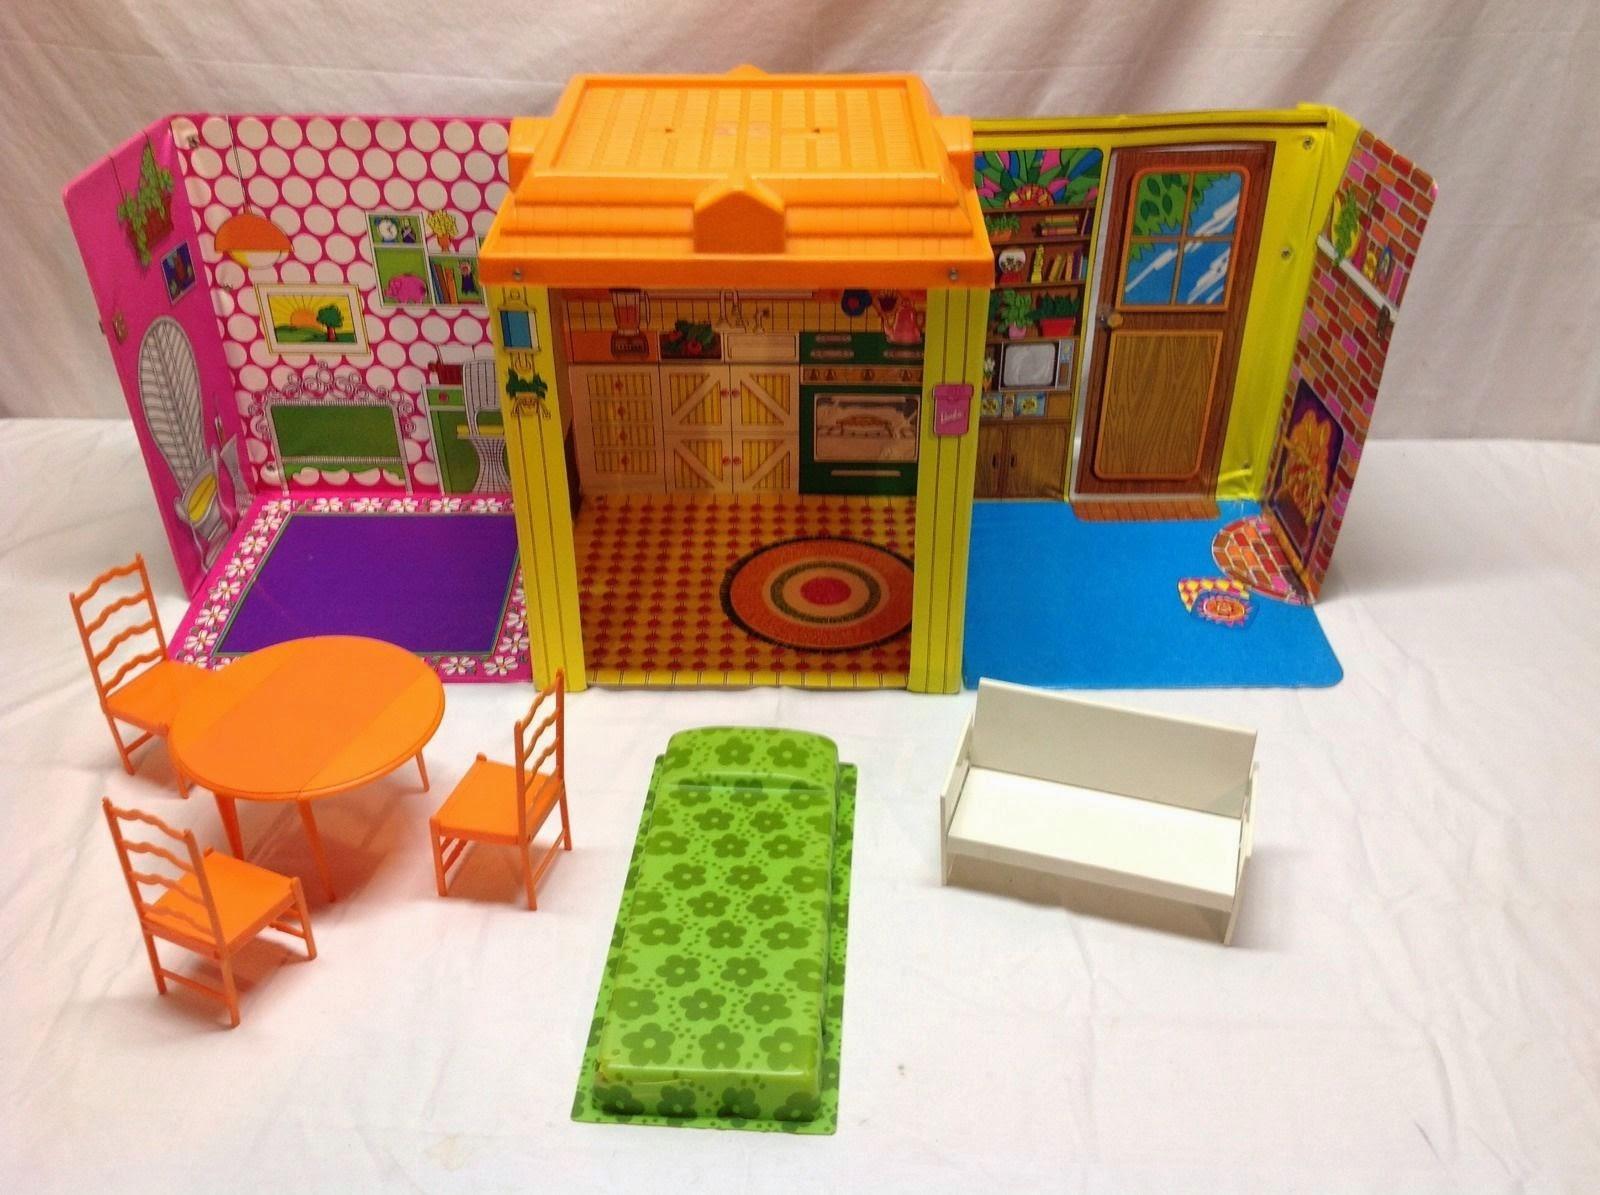 Vasca Da Bagno Barbie Anni 70 : Casa da bambola prudence magazine di sopravvivenza culturale